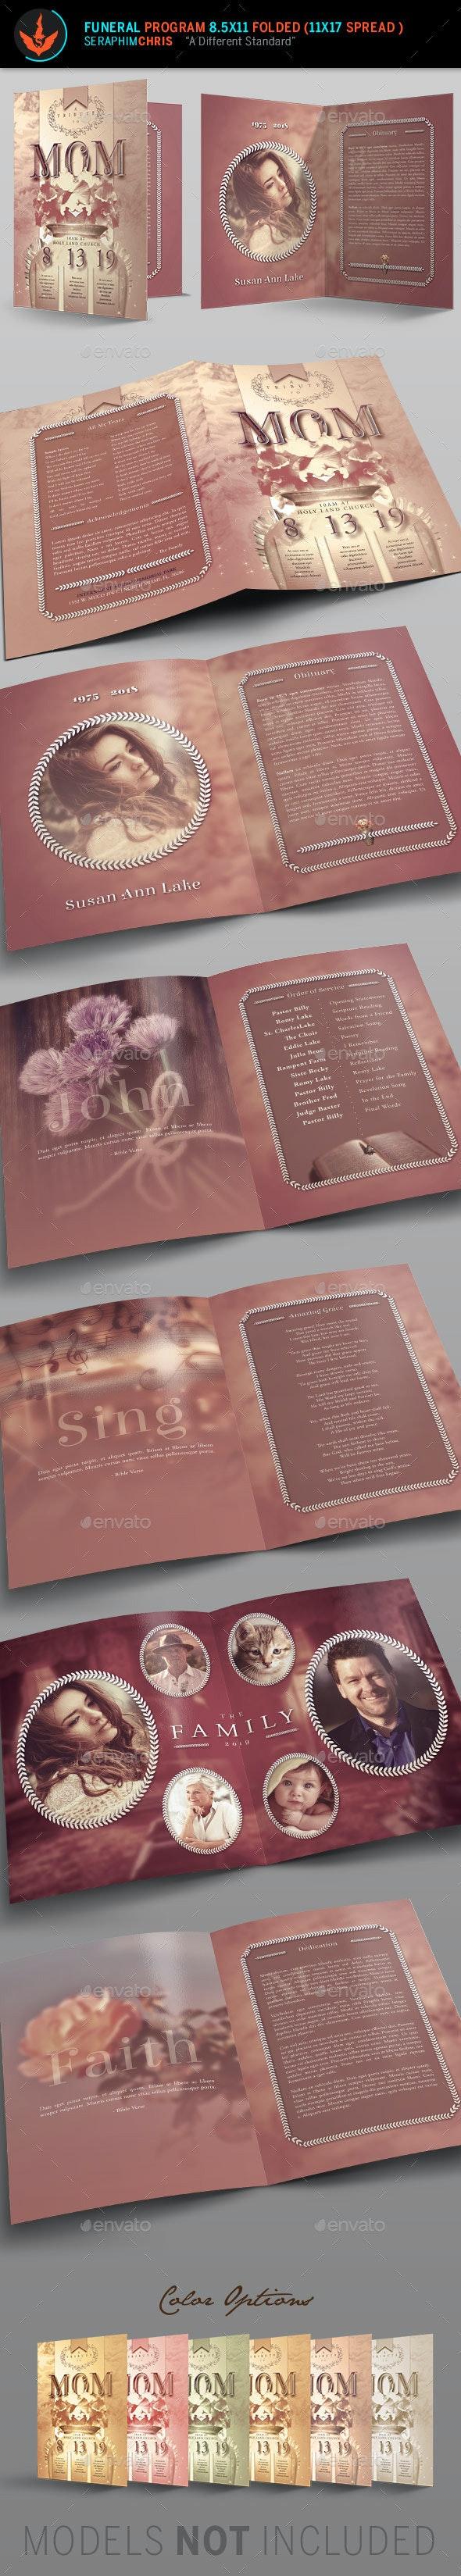 Tribute Funeral Program Template - Informational Brochures